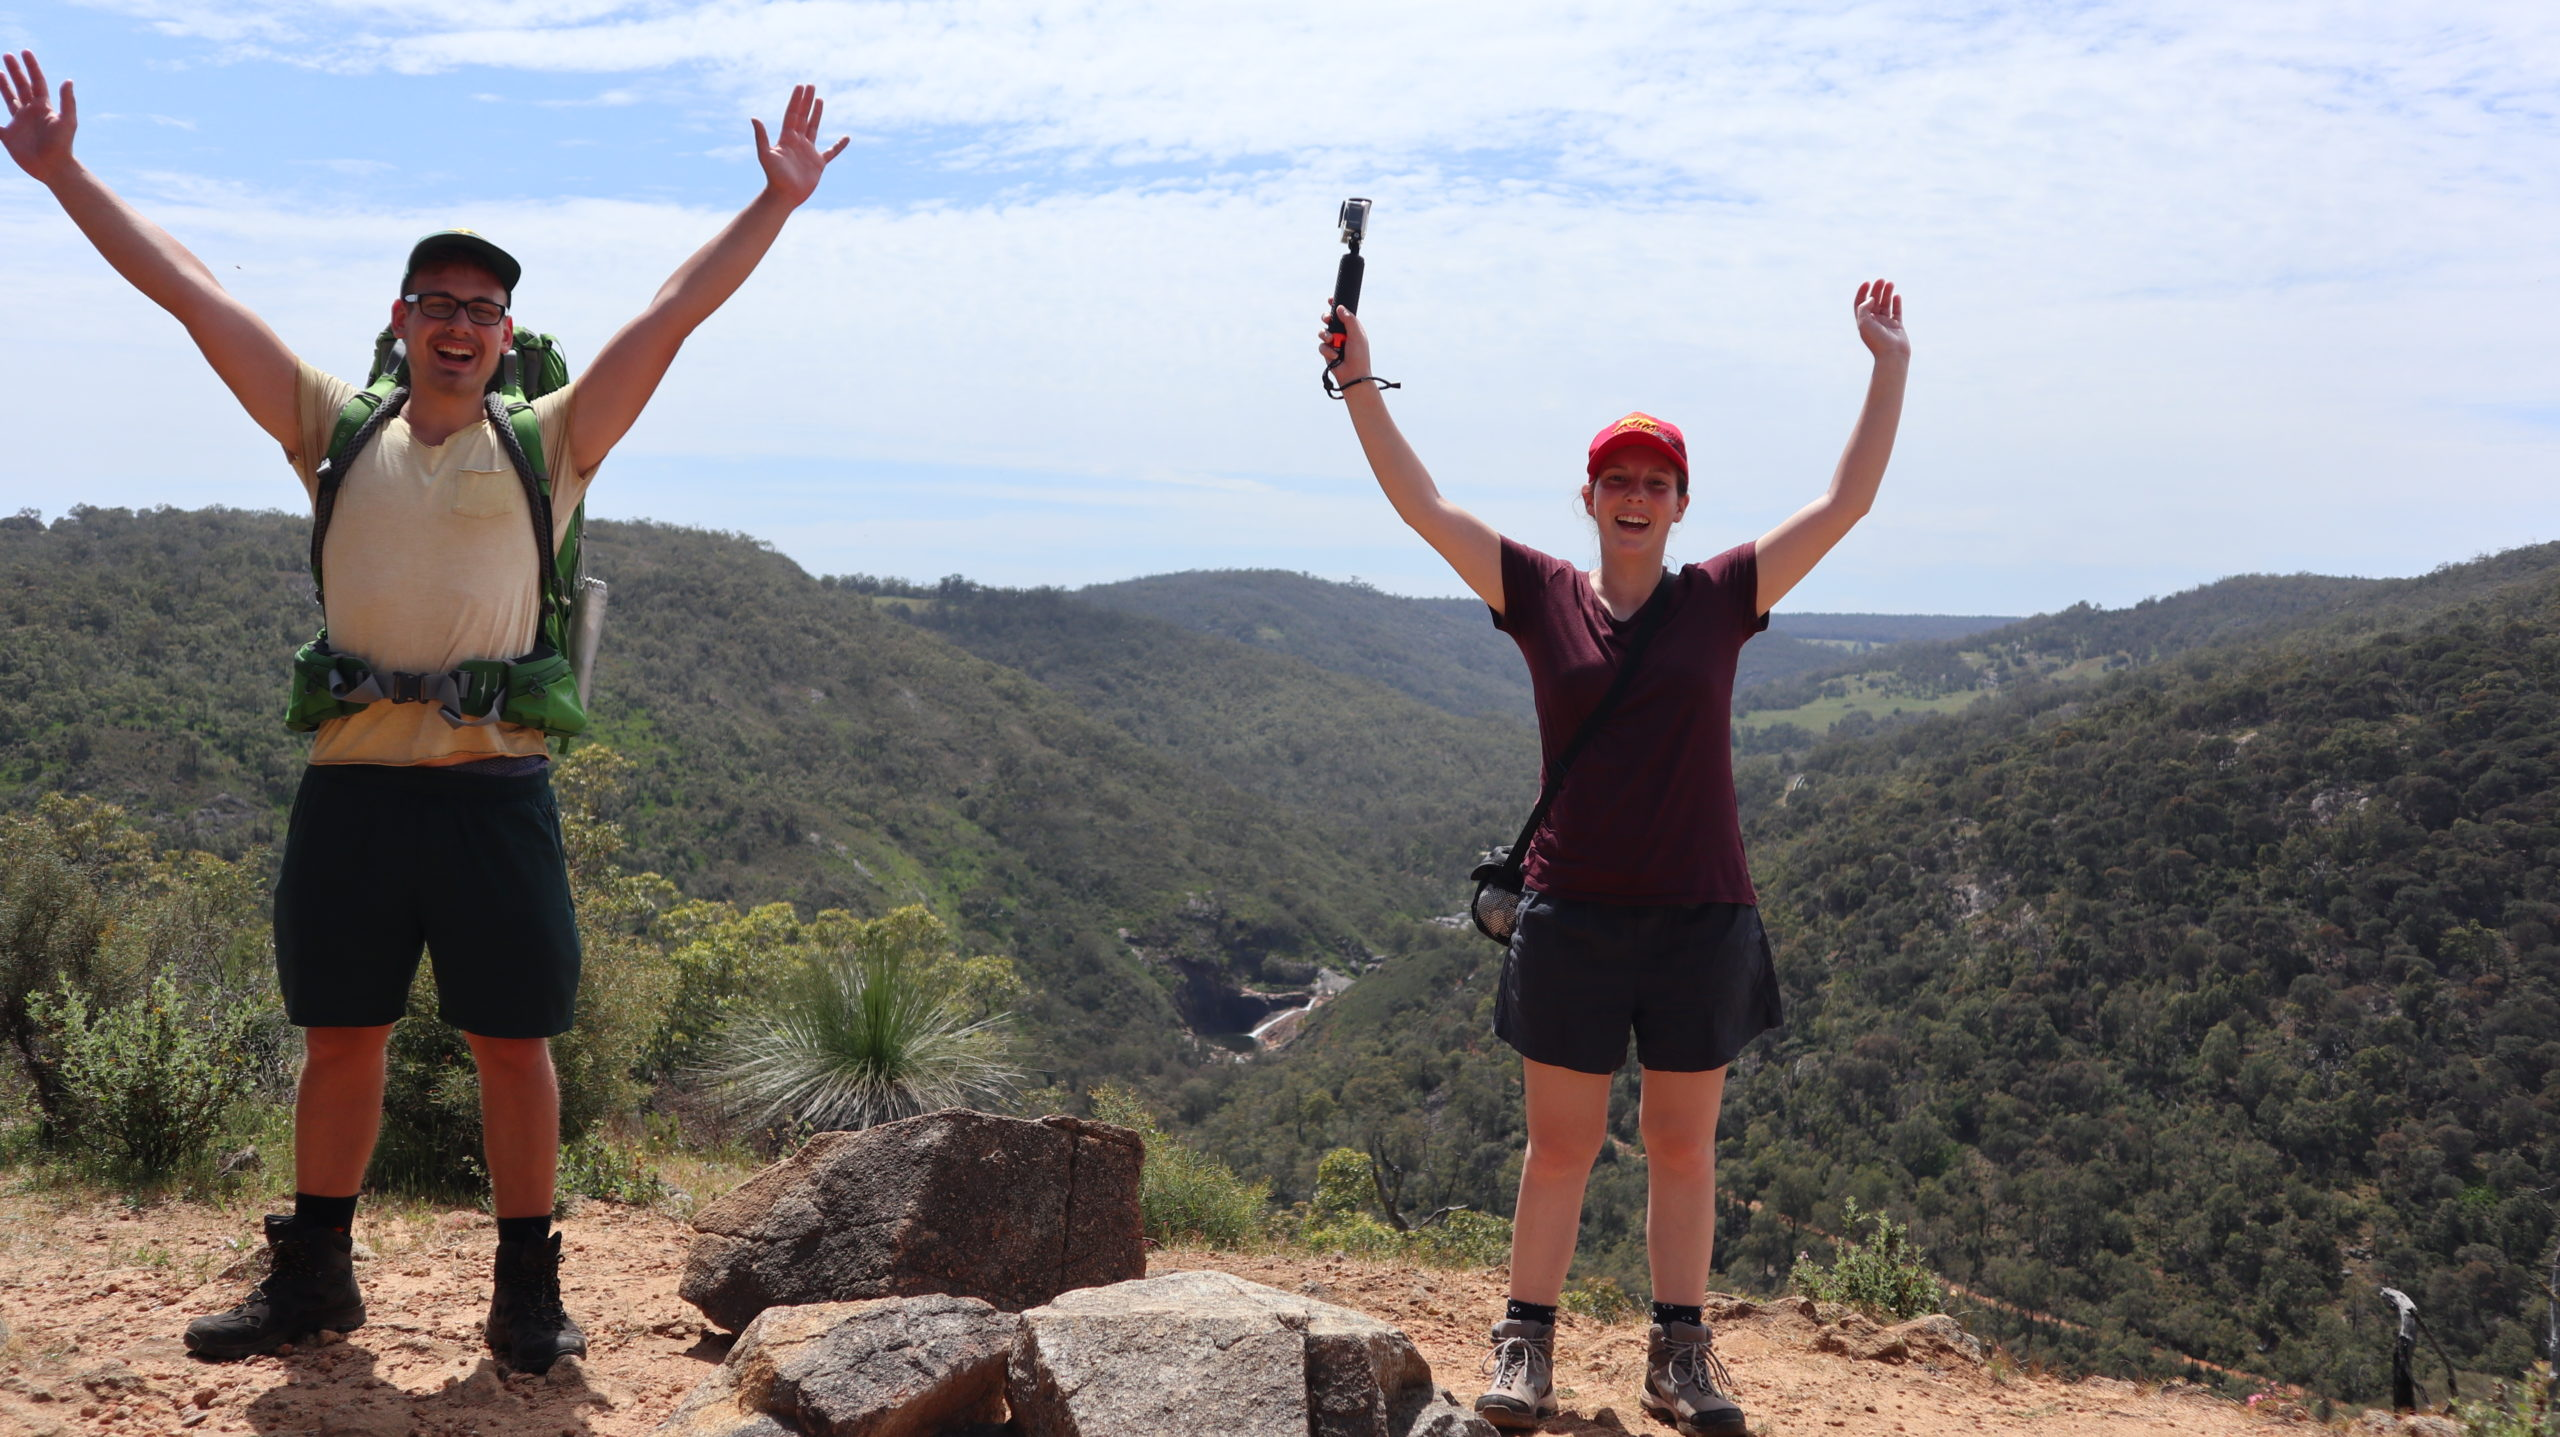 Angst: Gipfel mit Daniel und Jenny